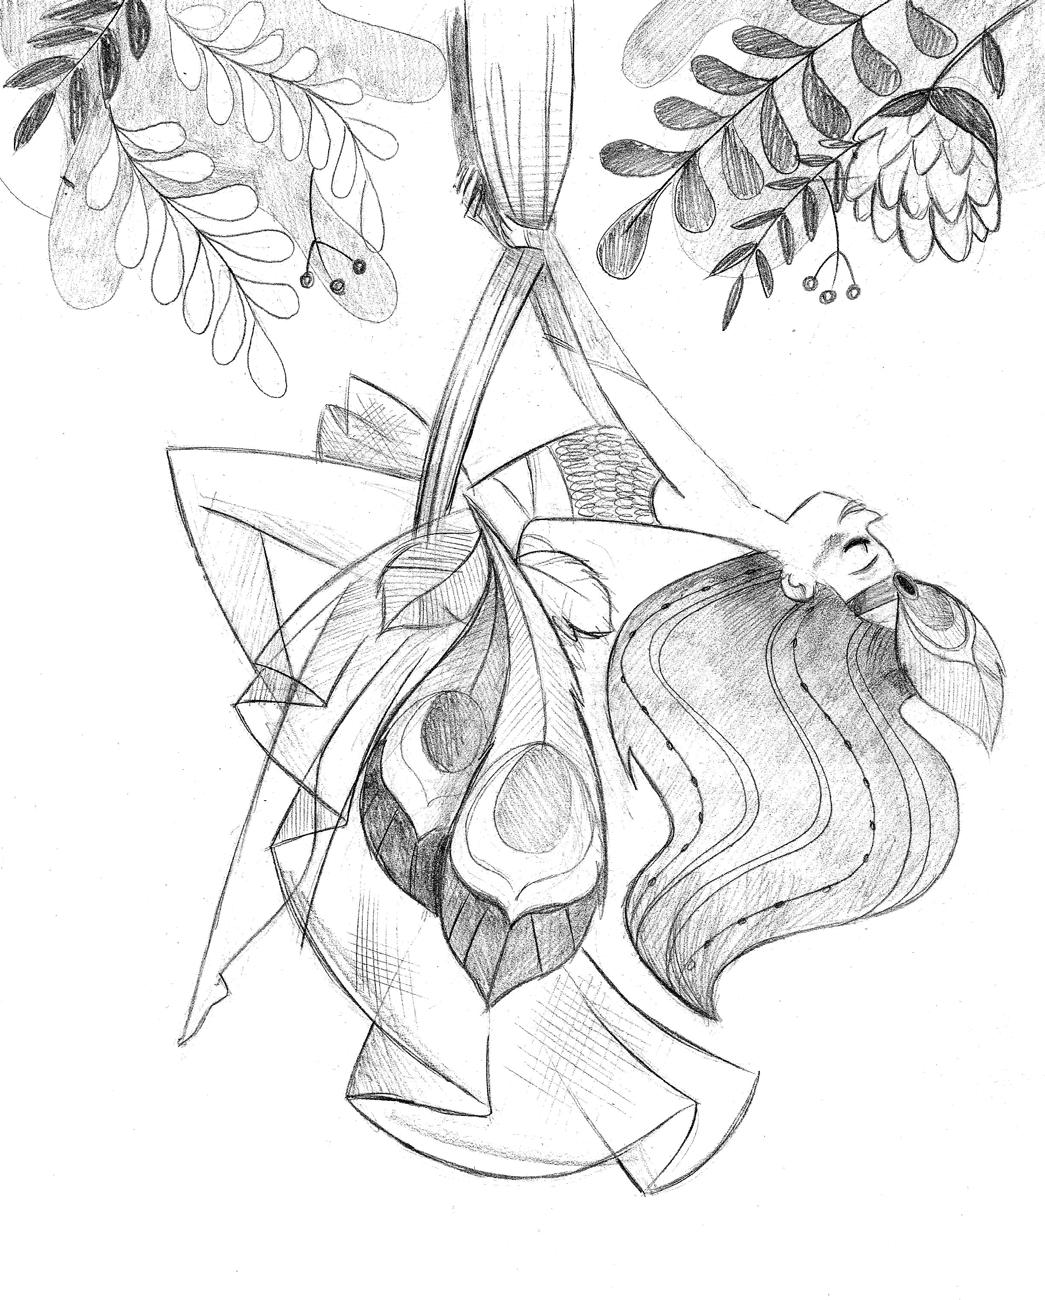 Peacock Sketch Drawing